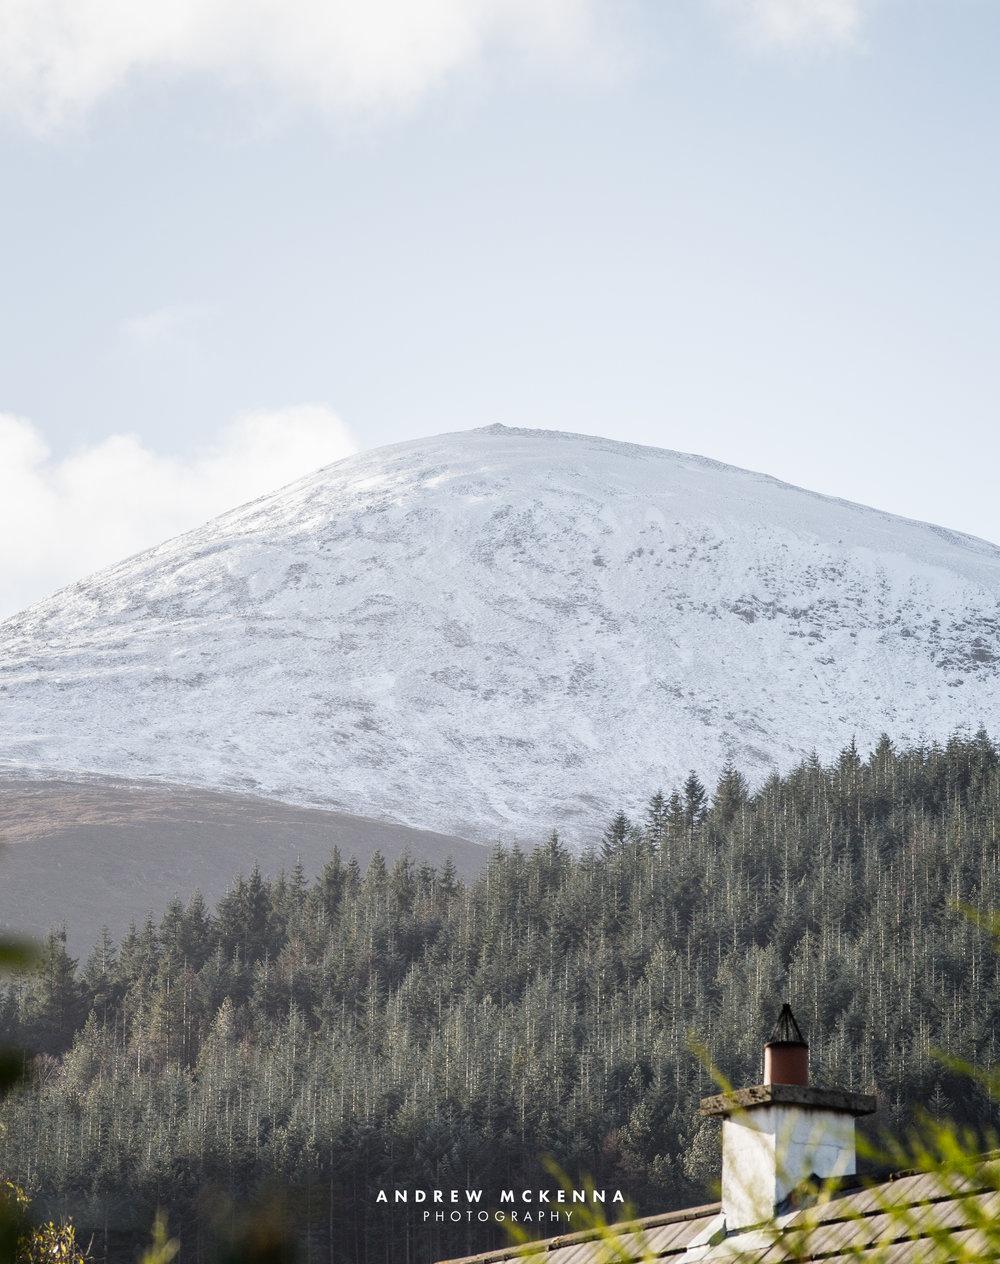 Snowy Slieve Donard mountain from my garden in Newcastle.